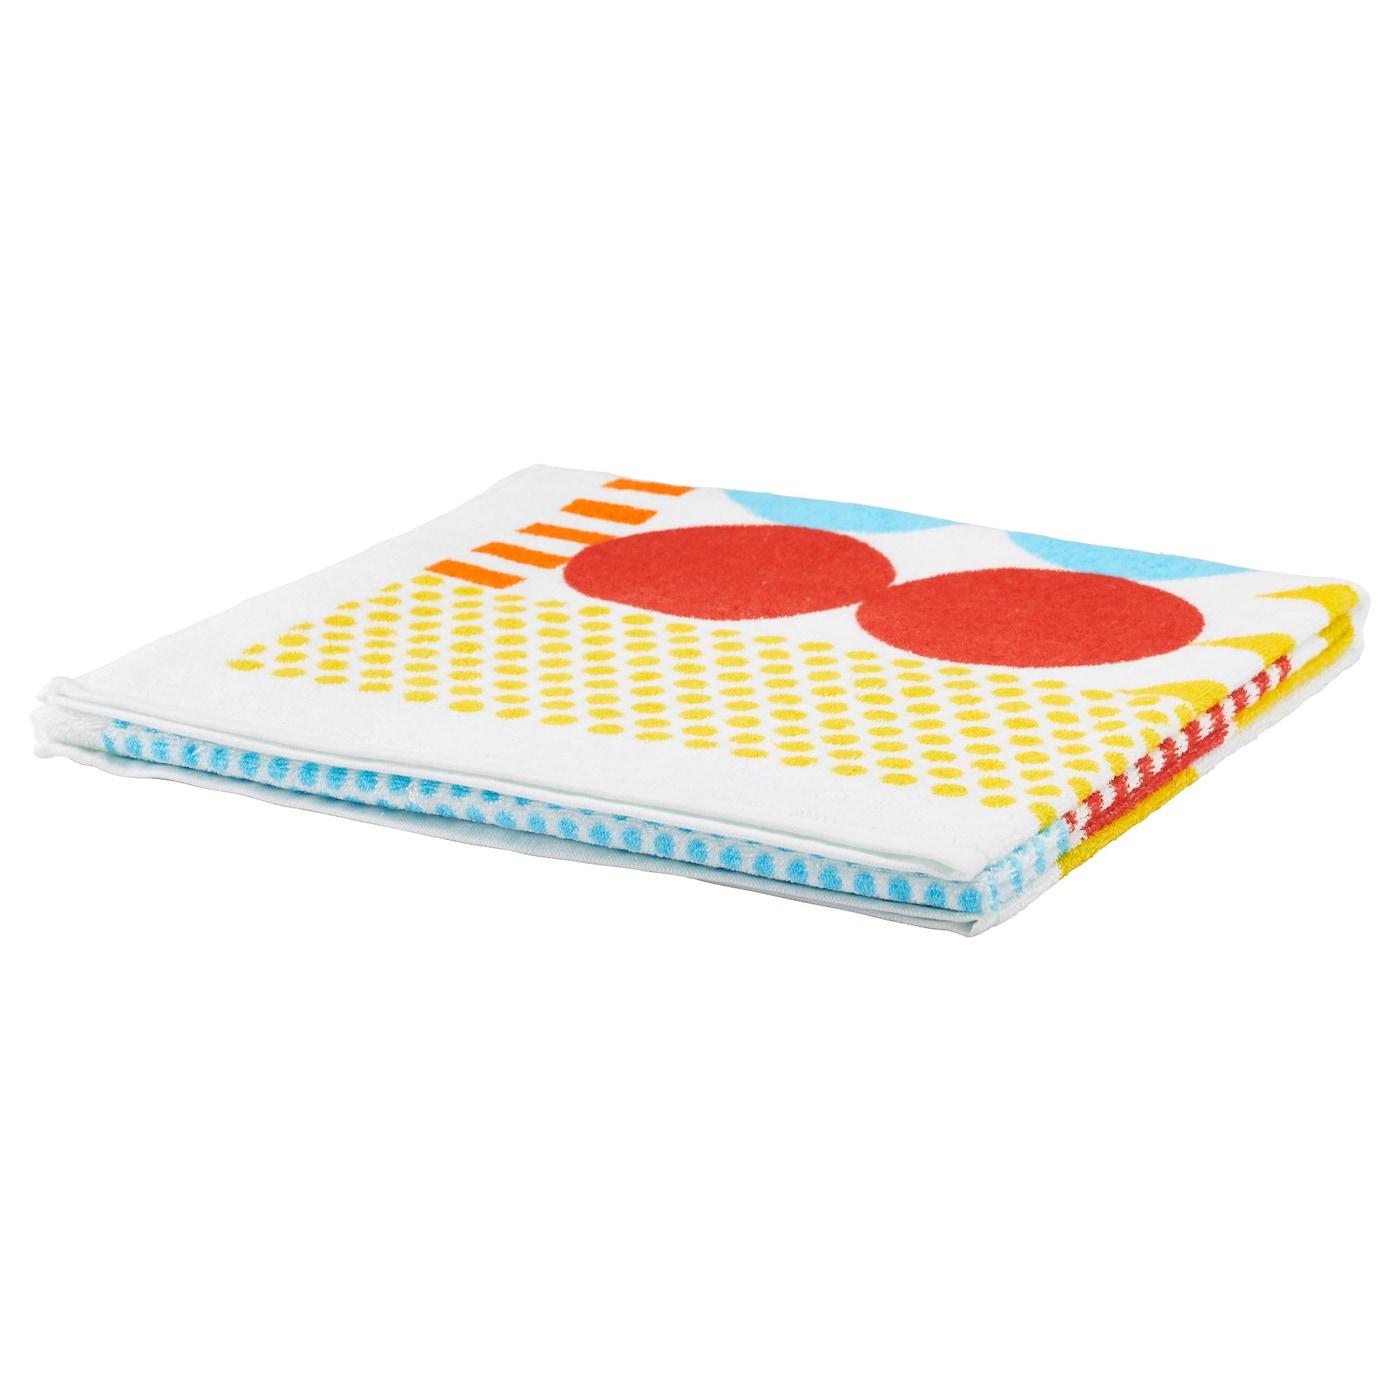 nimmern serviette multicolore 50x100 cm ikea. Black Bedroom Furniture Sets. Home Design Ideas